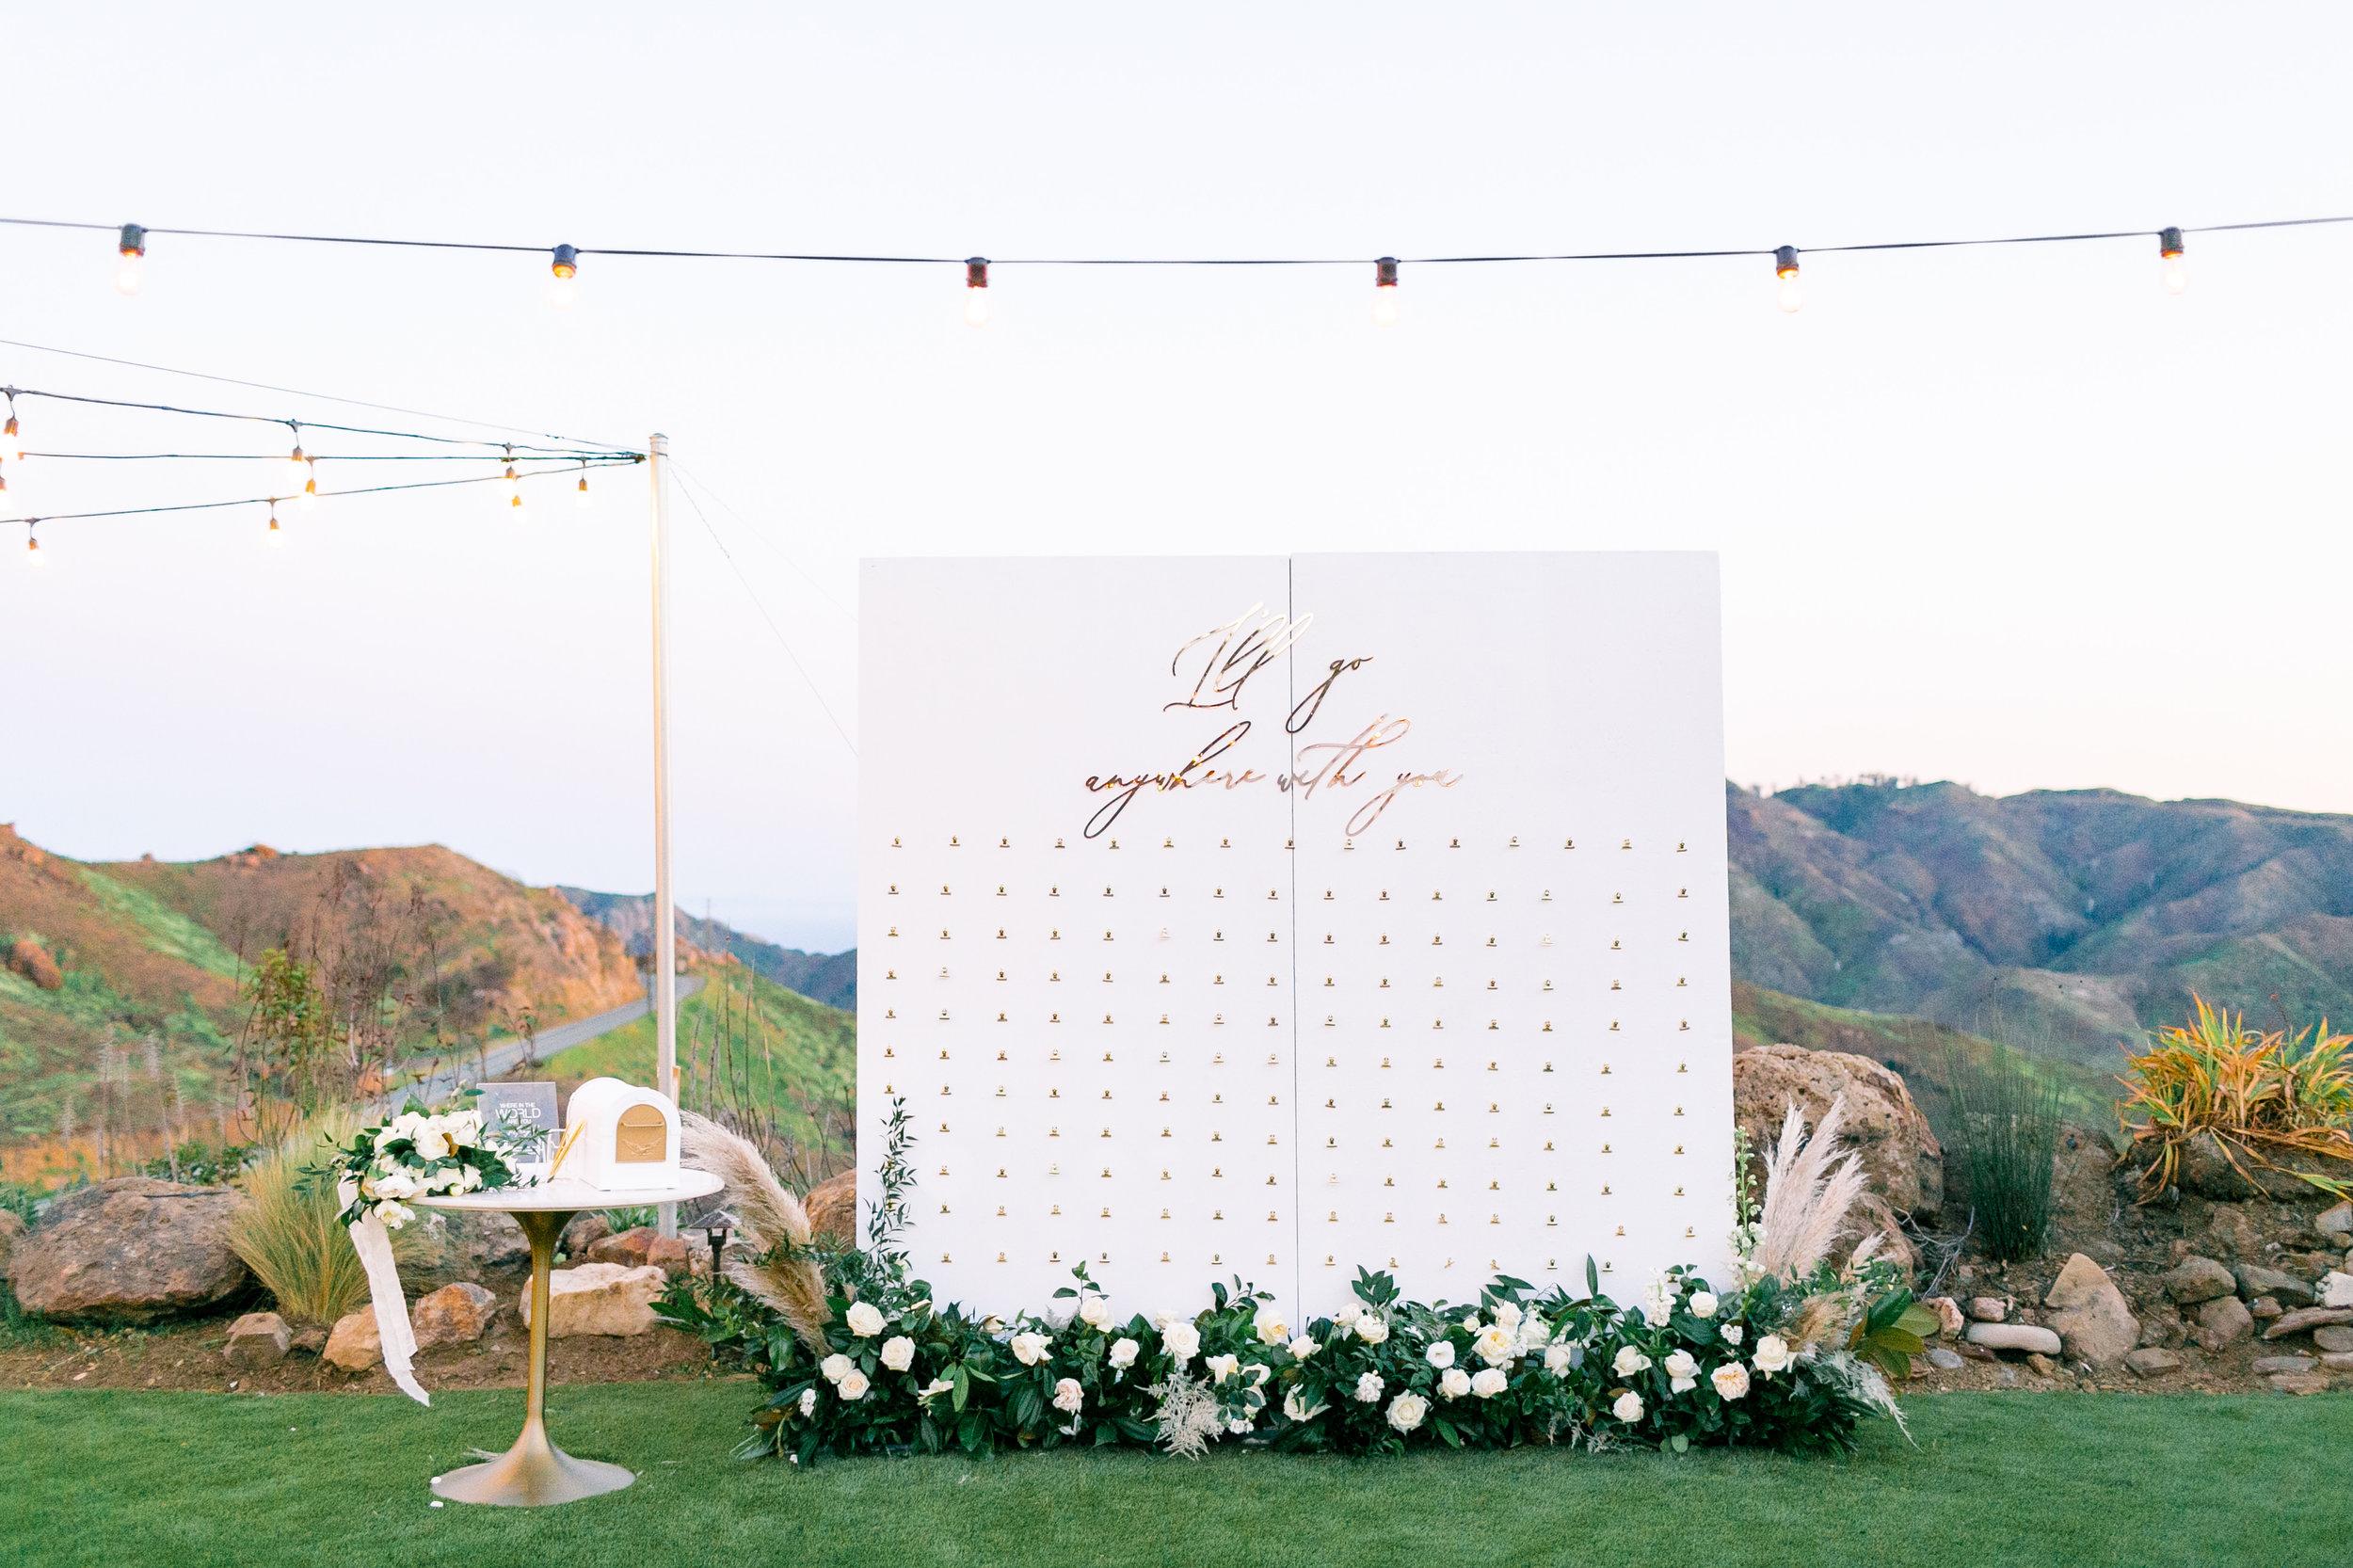 Levi & Amelia's Wedding - Natalie Schutt Photography - Details-133.jpg